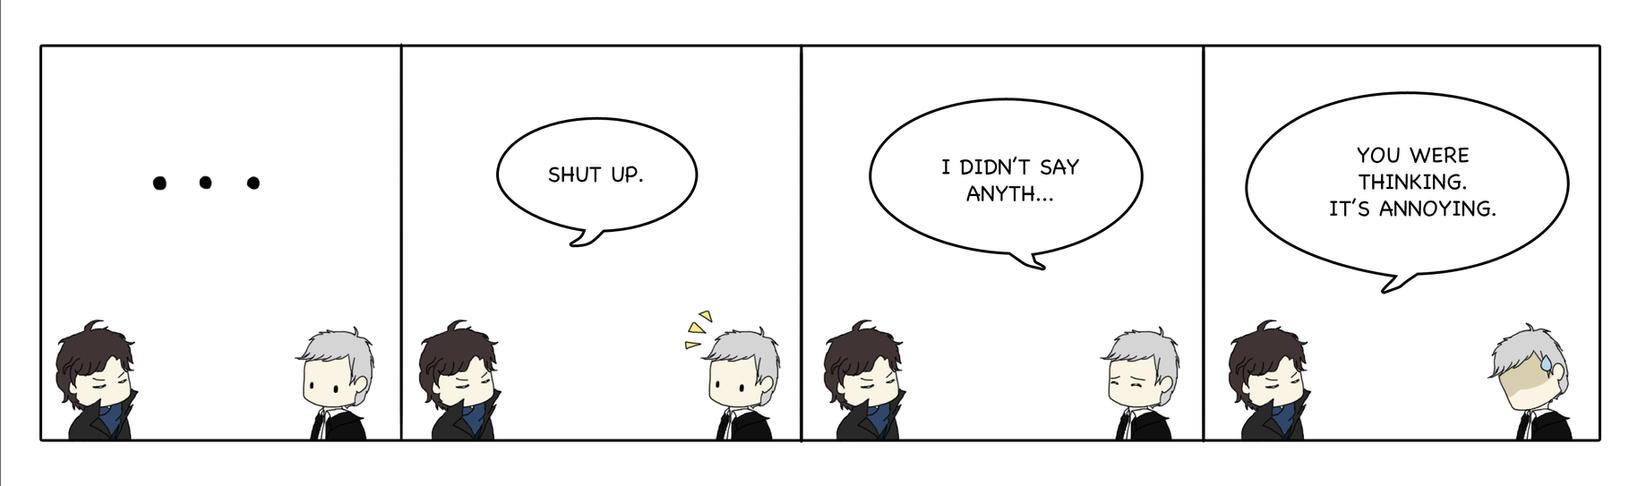 BBC Sherlock: Shut Up. by melelisun